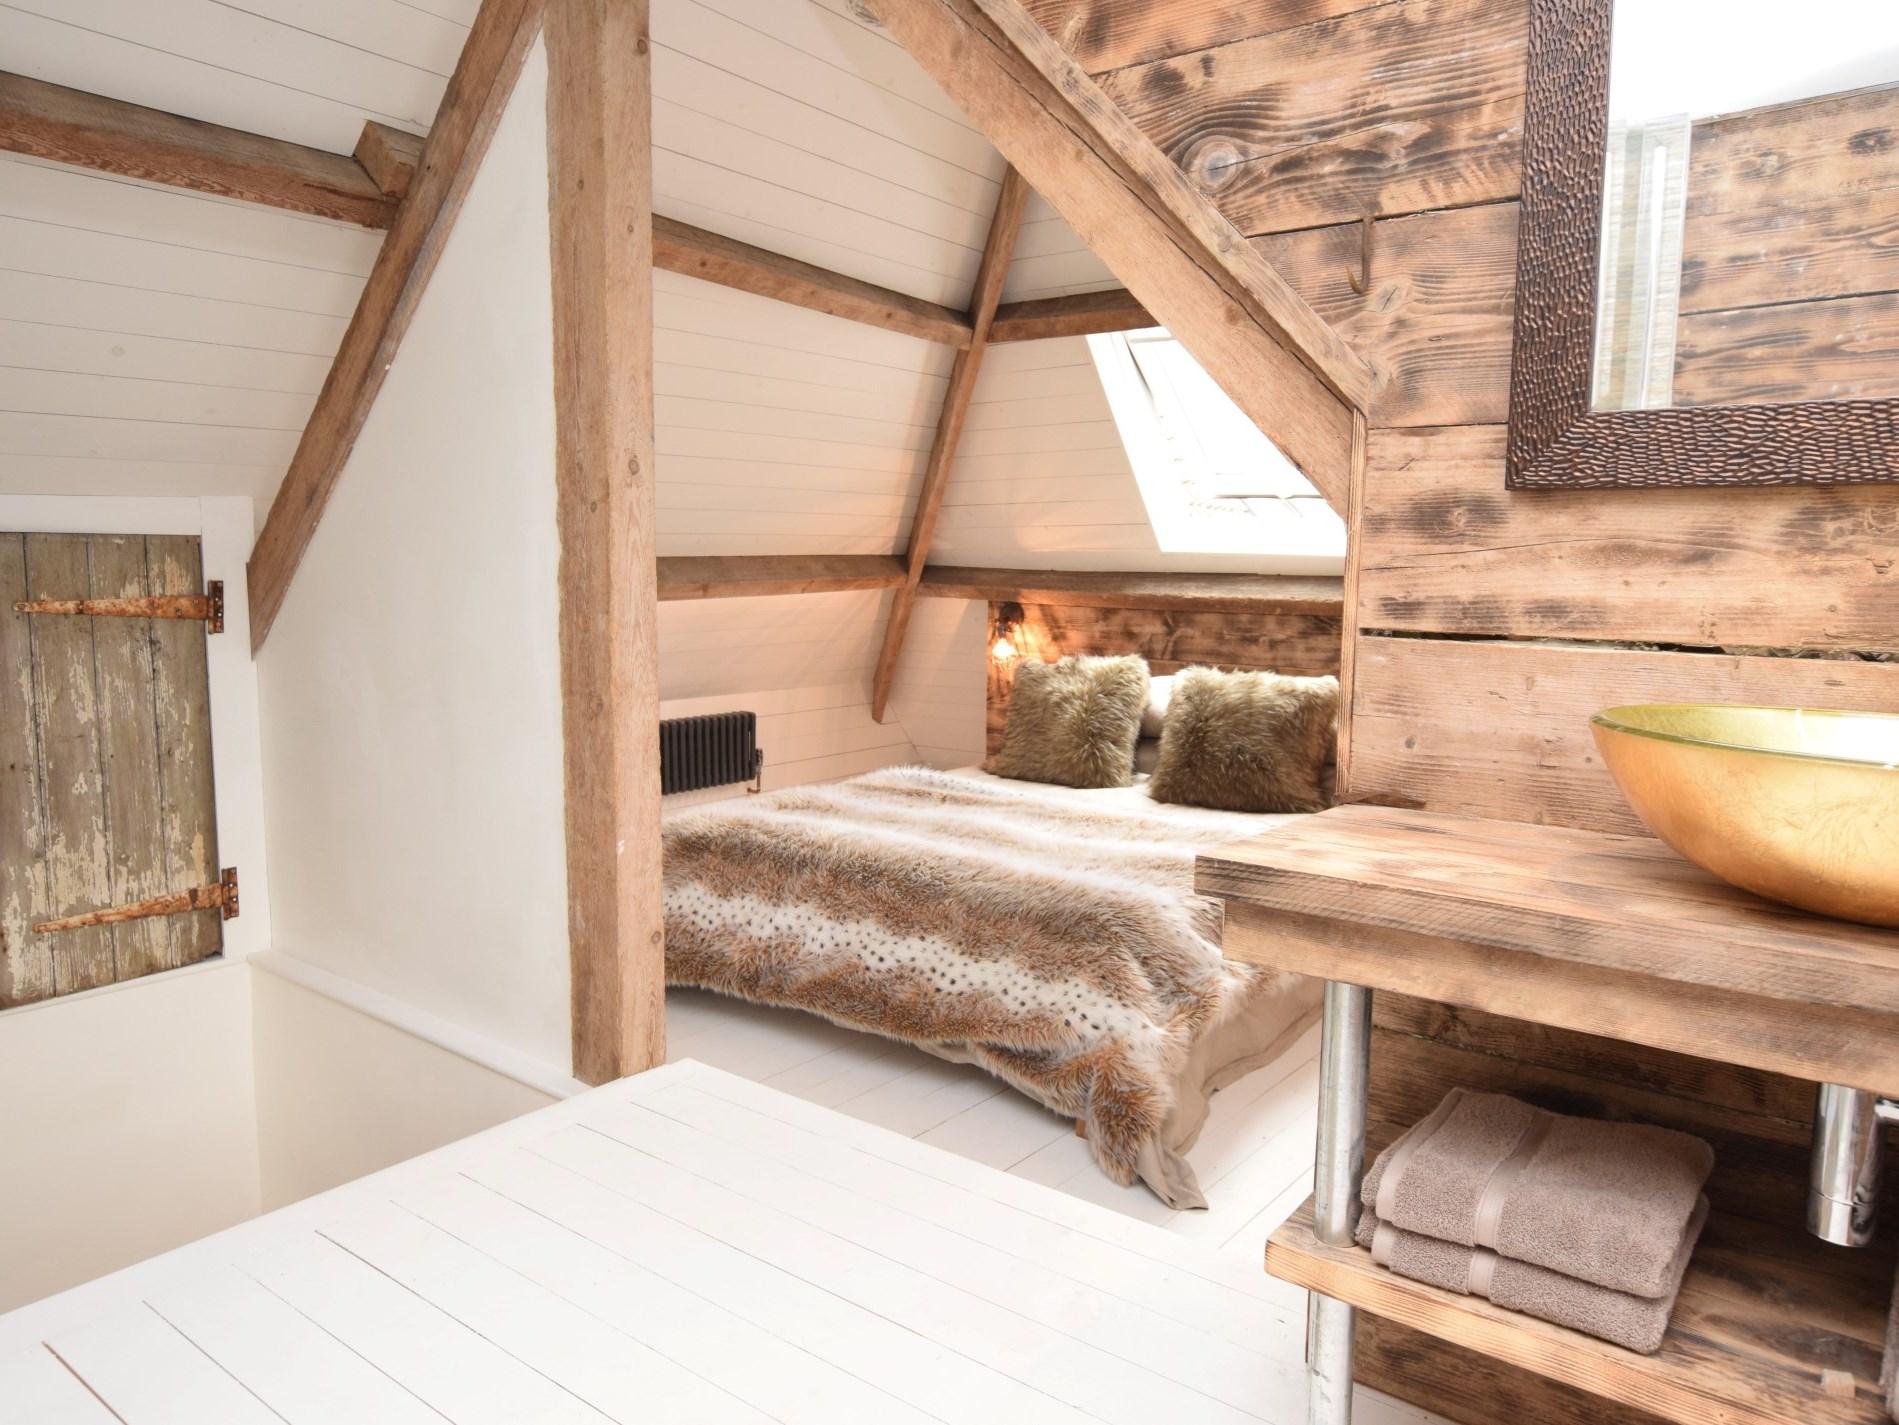 Stylish mezzanine bedroom set into the eaves